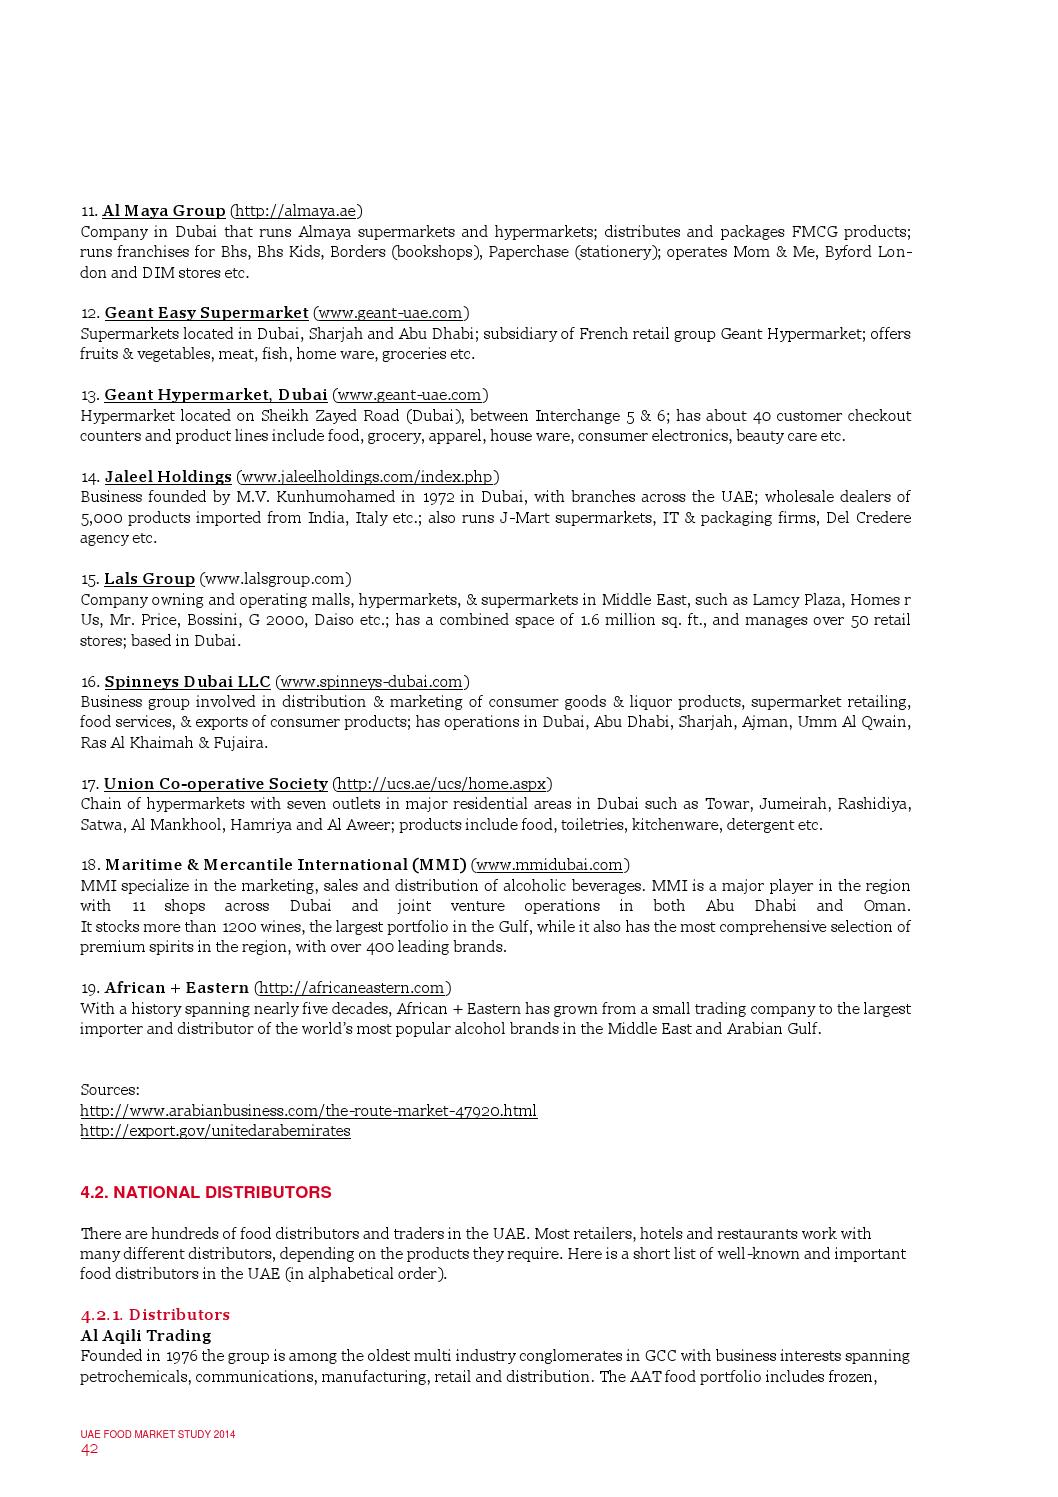 Bbk uae the uae food market 09 2014 by Switzerland Global Enterprise